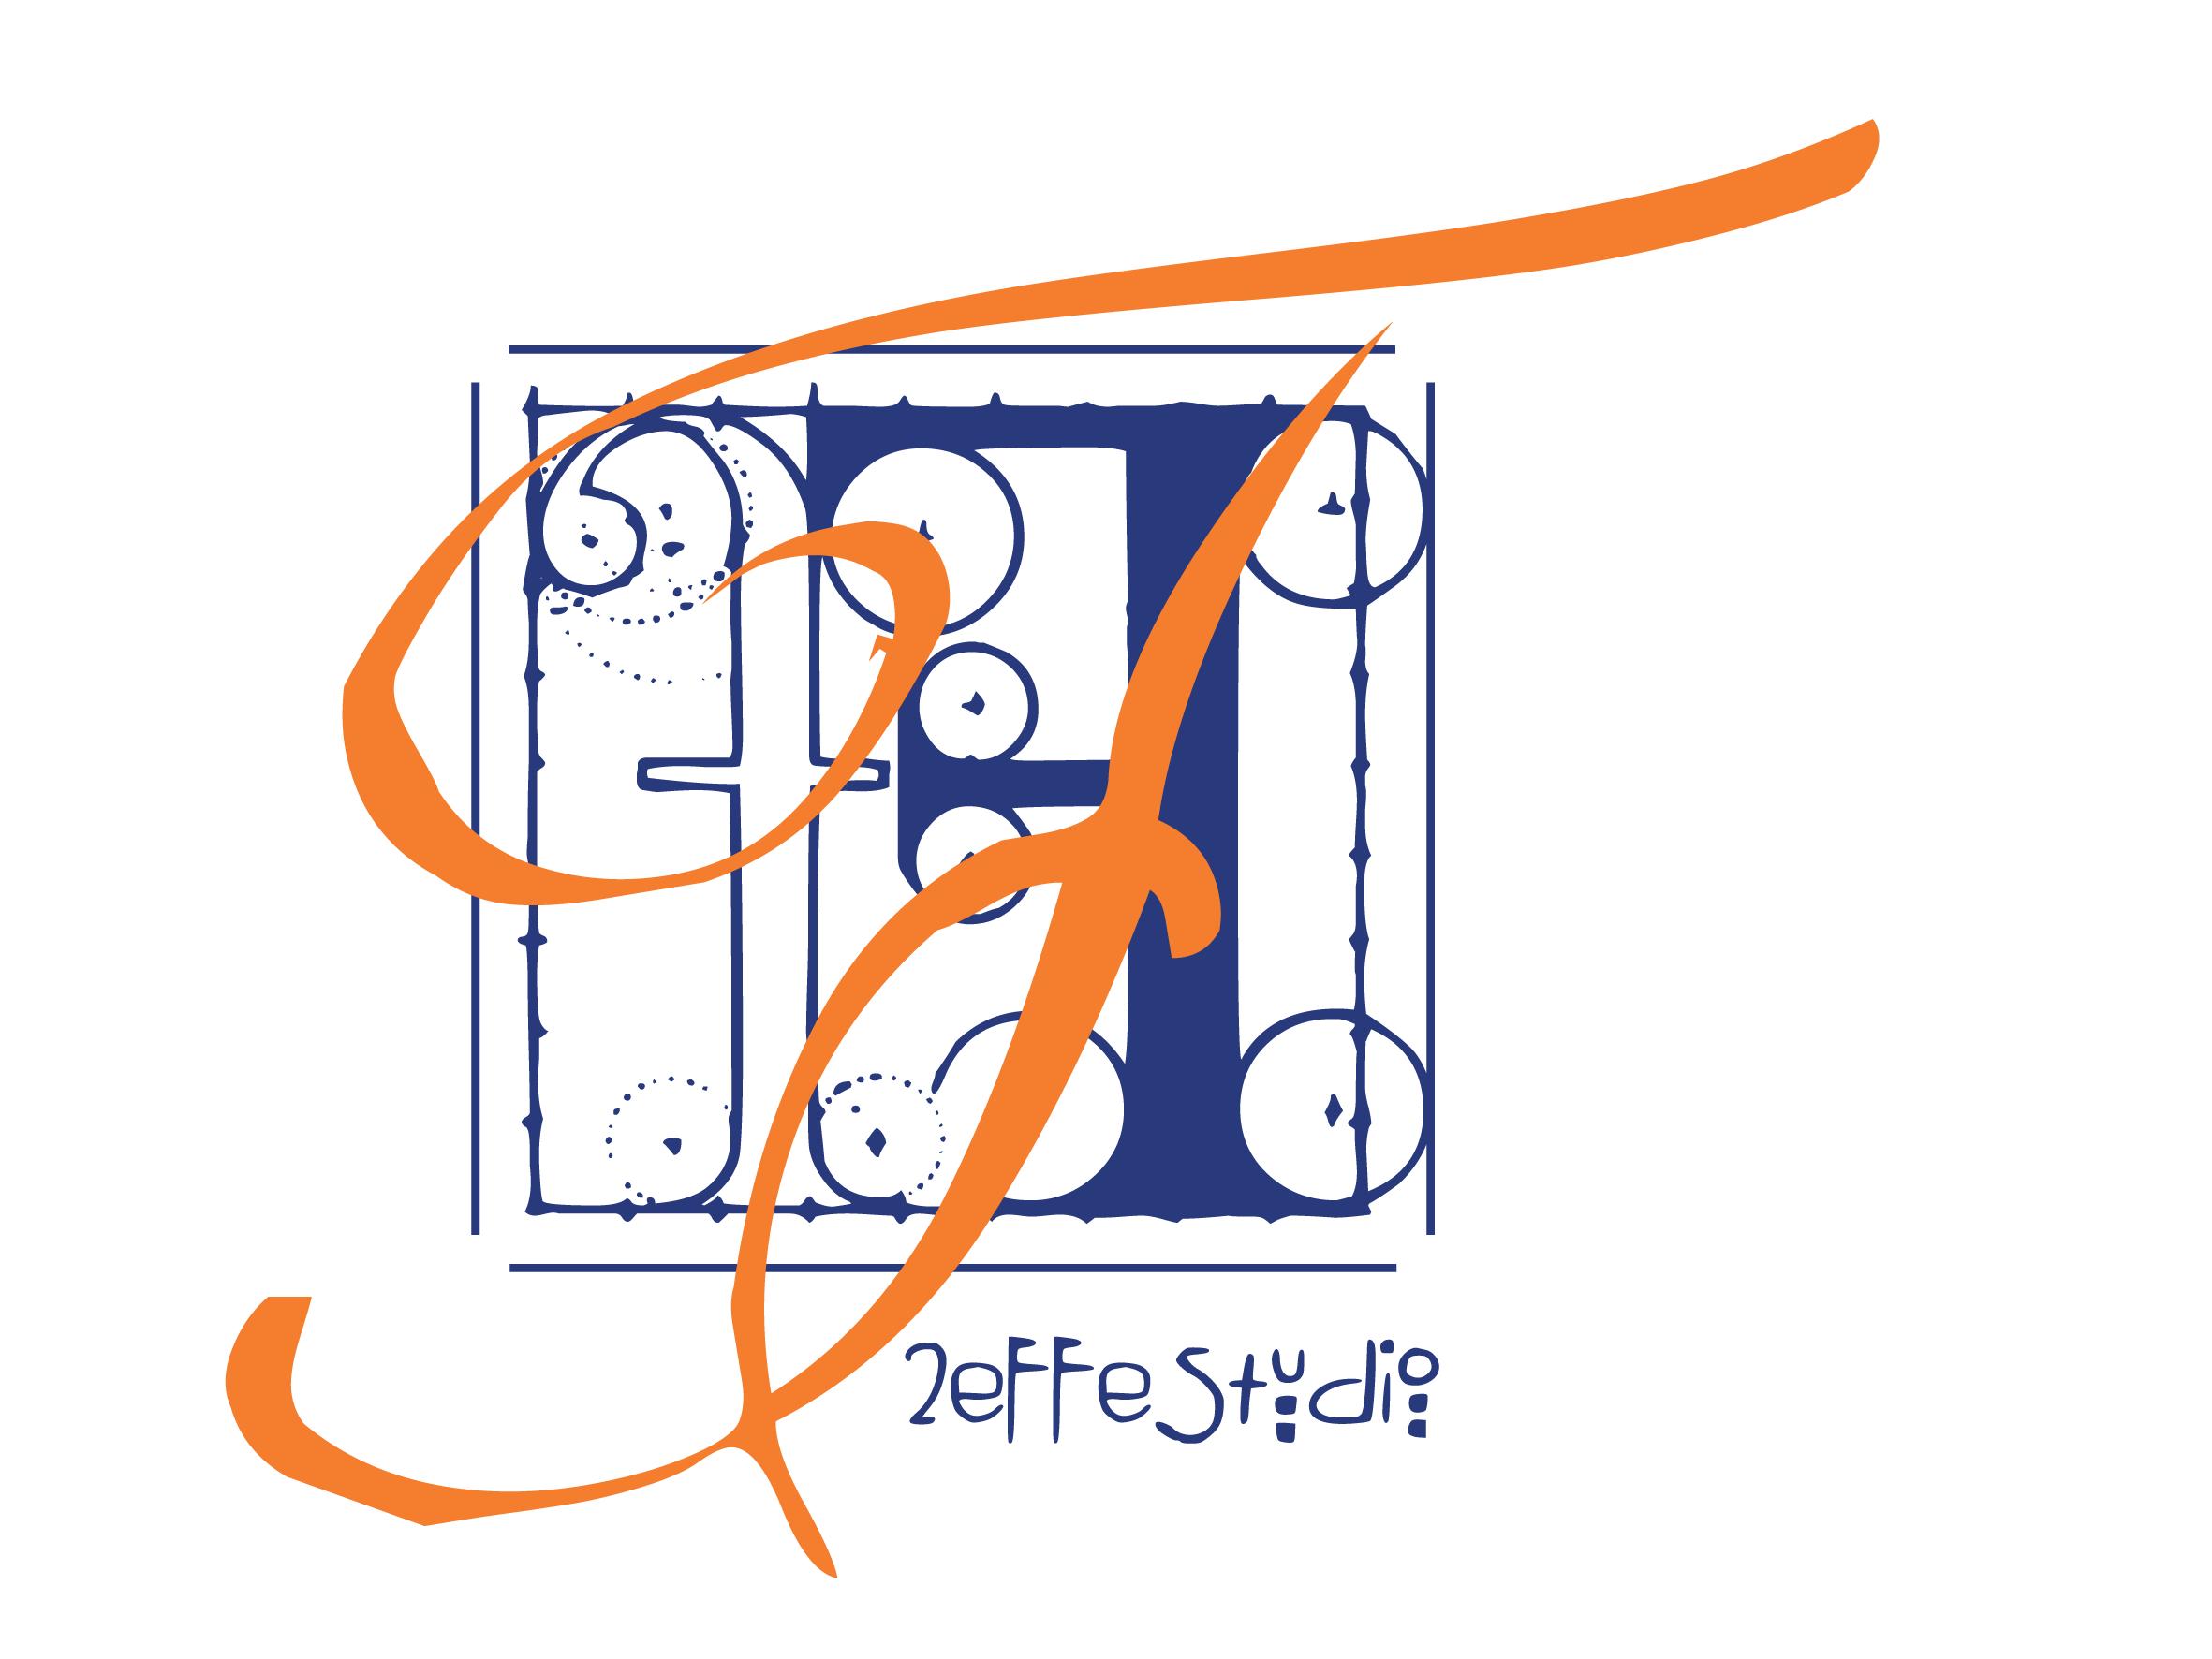 Logo 2eFFeStudio